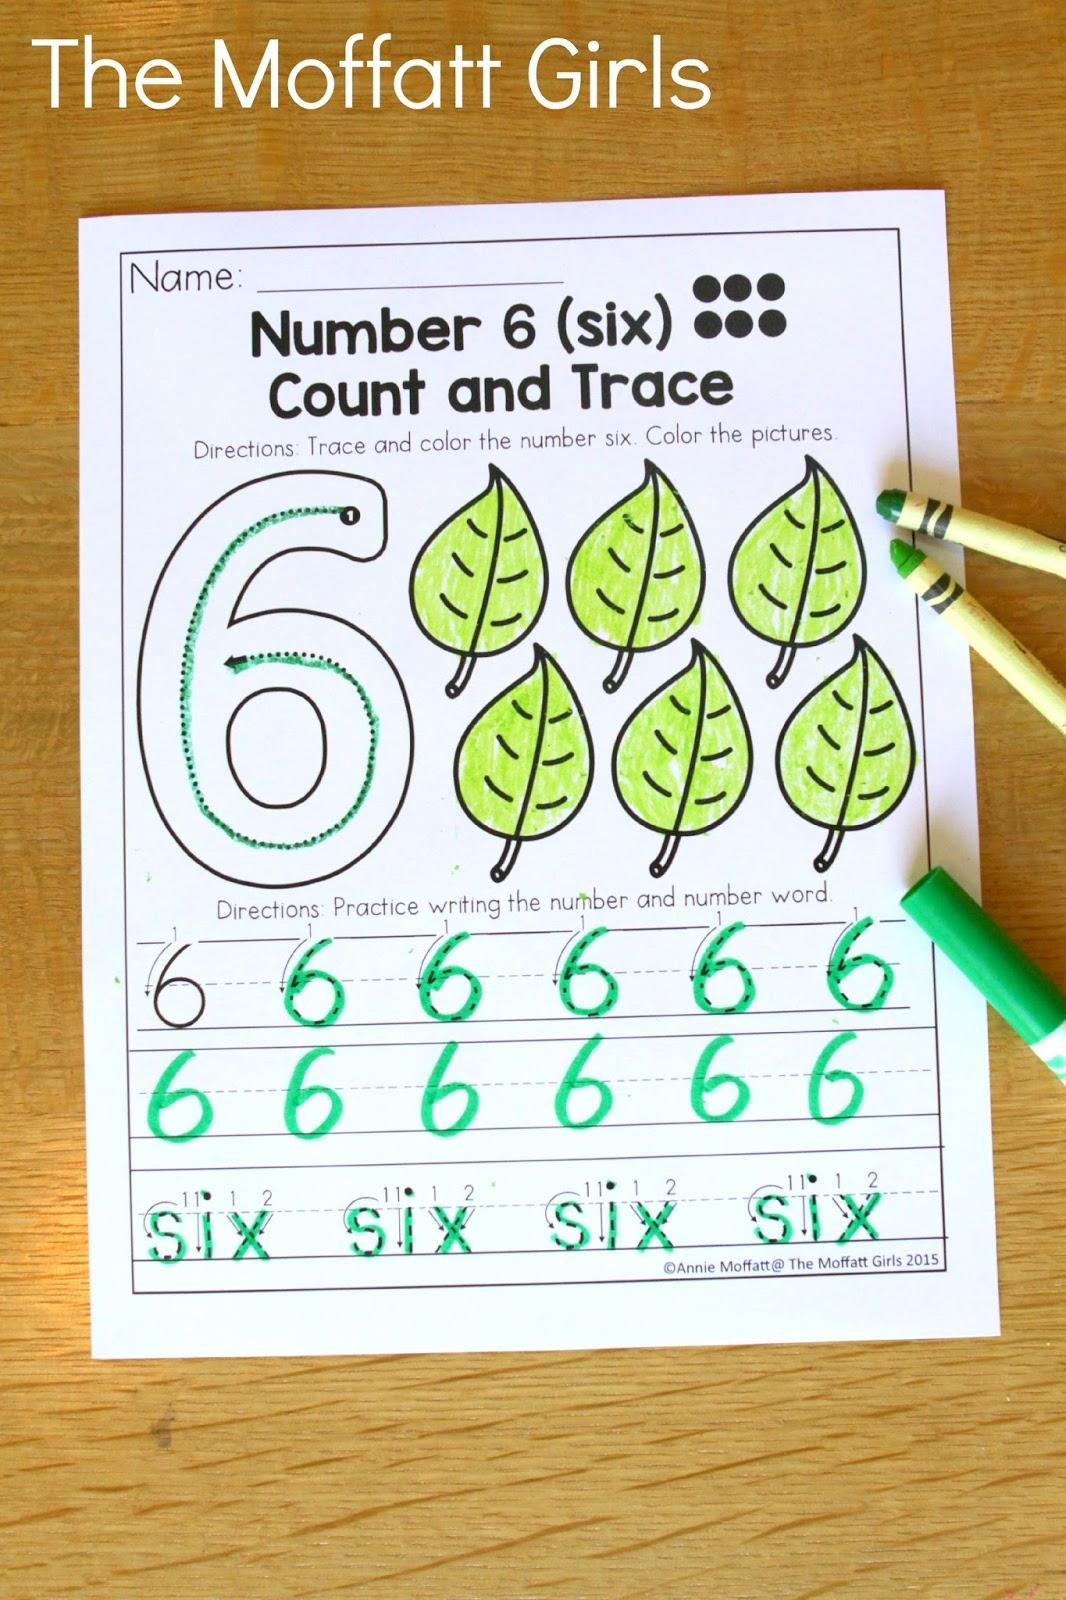 October Fun Filled Learning Resources! | The Moffatt Girls | Bloglovin\'